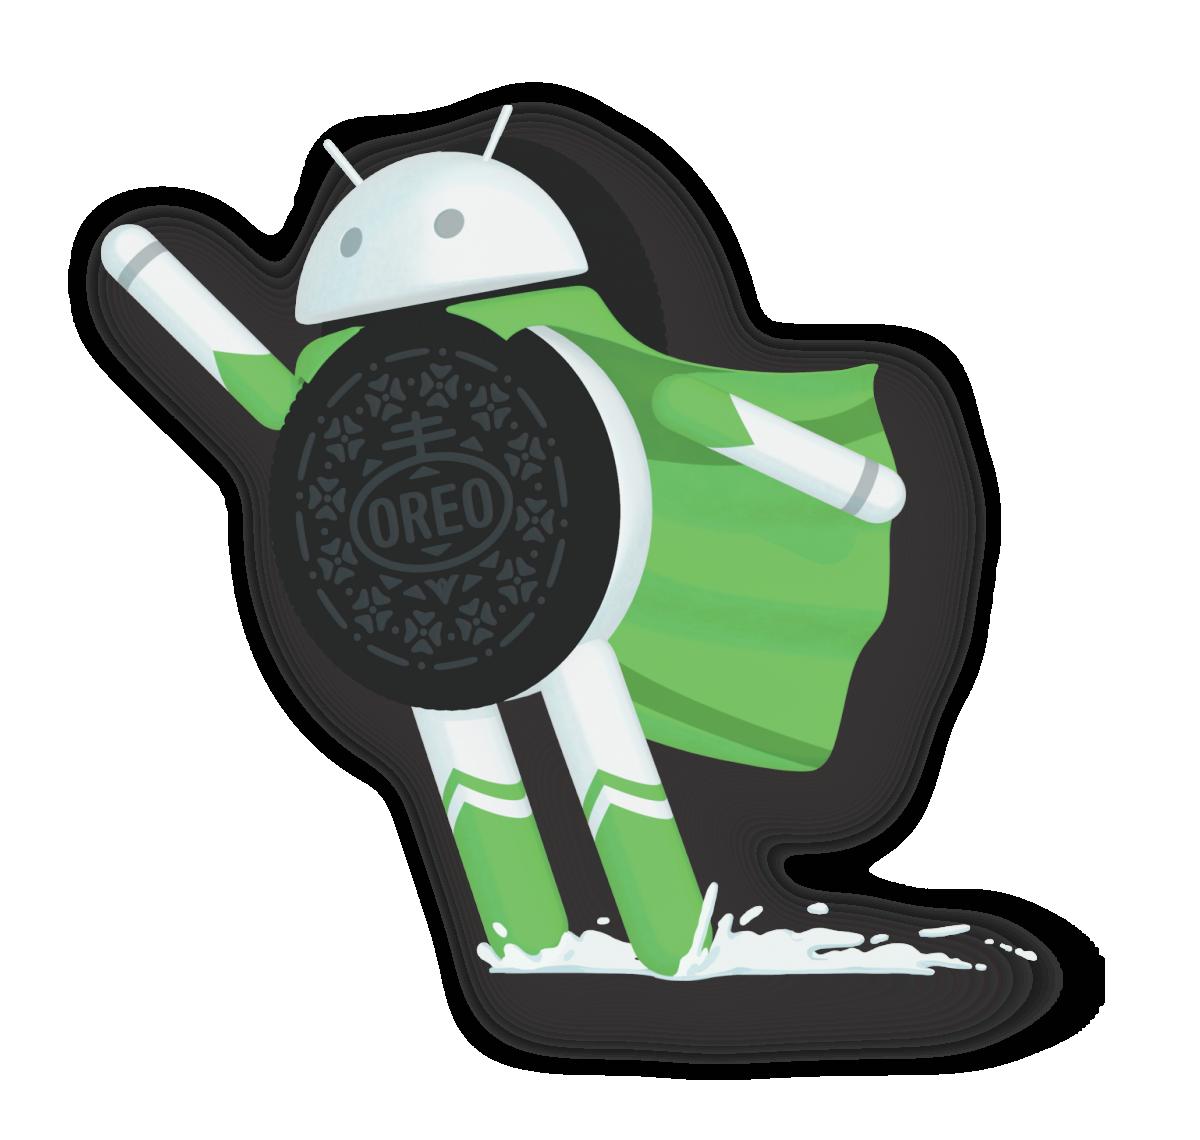 secao 2 - Android - img mascote 1